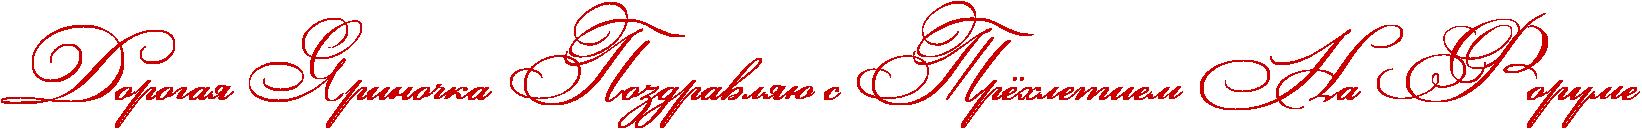 http://x-lines.ru/icp/abW03/cc0000/0/54/RdorogayPRyrinoCkaPRpozdravlyUPsPRtrjhletiemPRnaPRforume.png